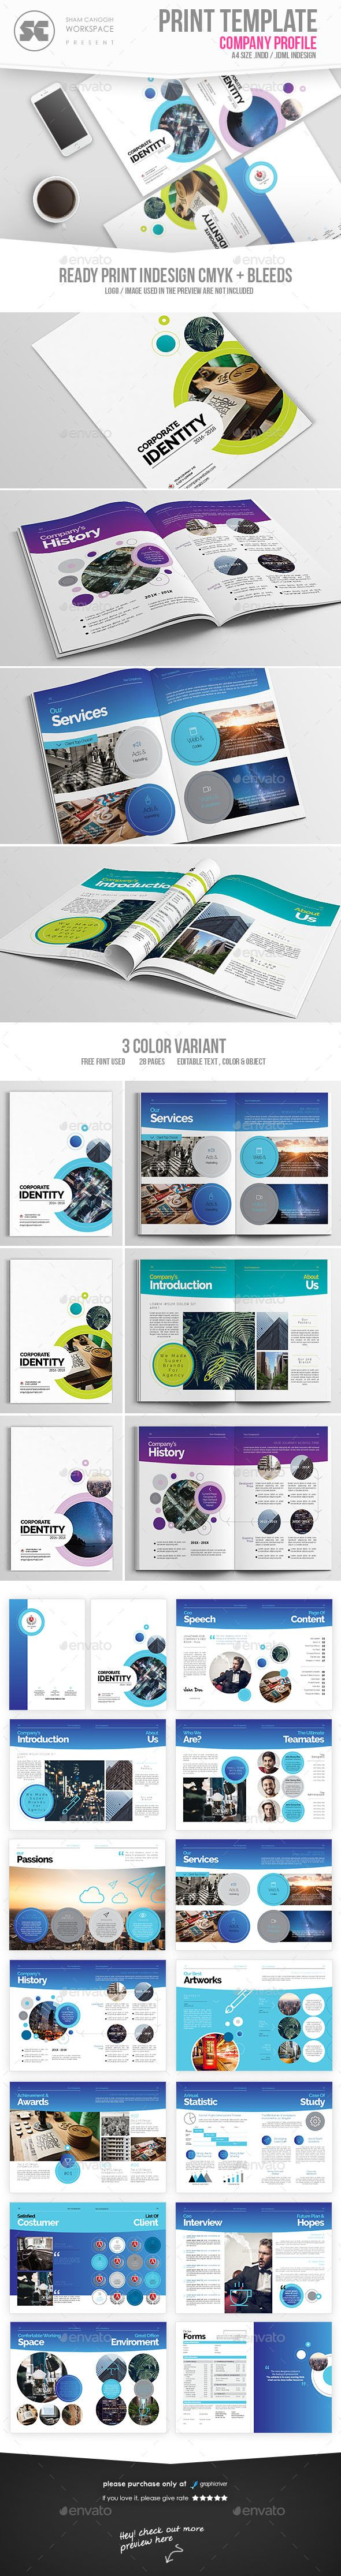 Company Profile | Company profile, Indesign templates and Profile